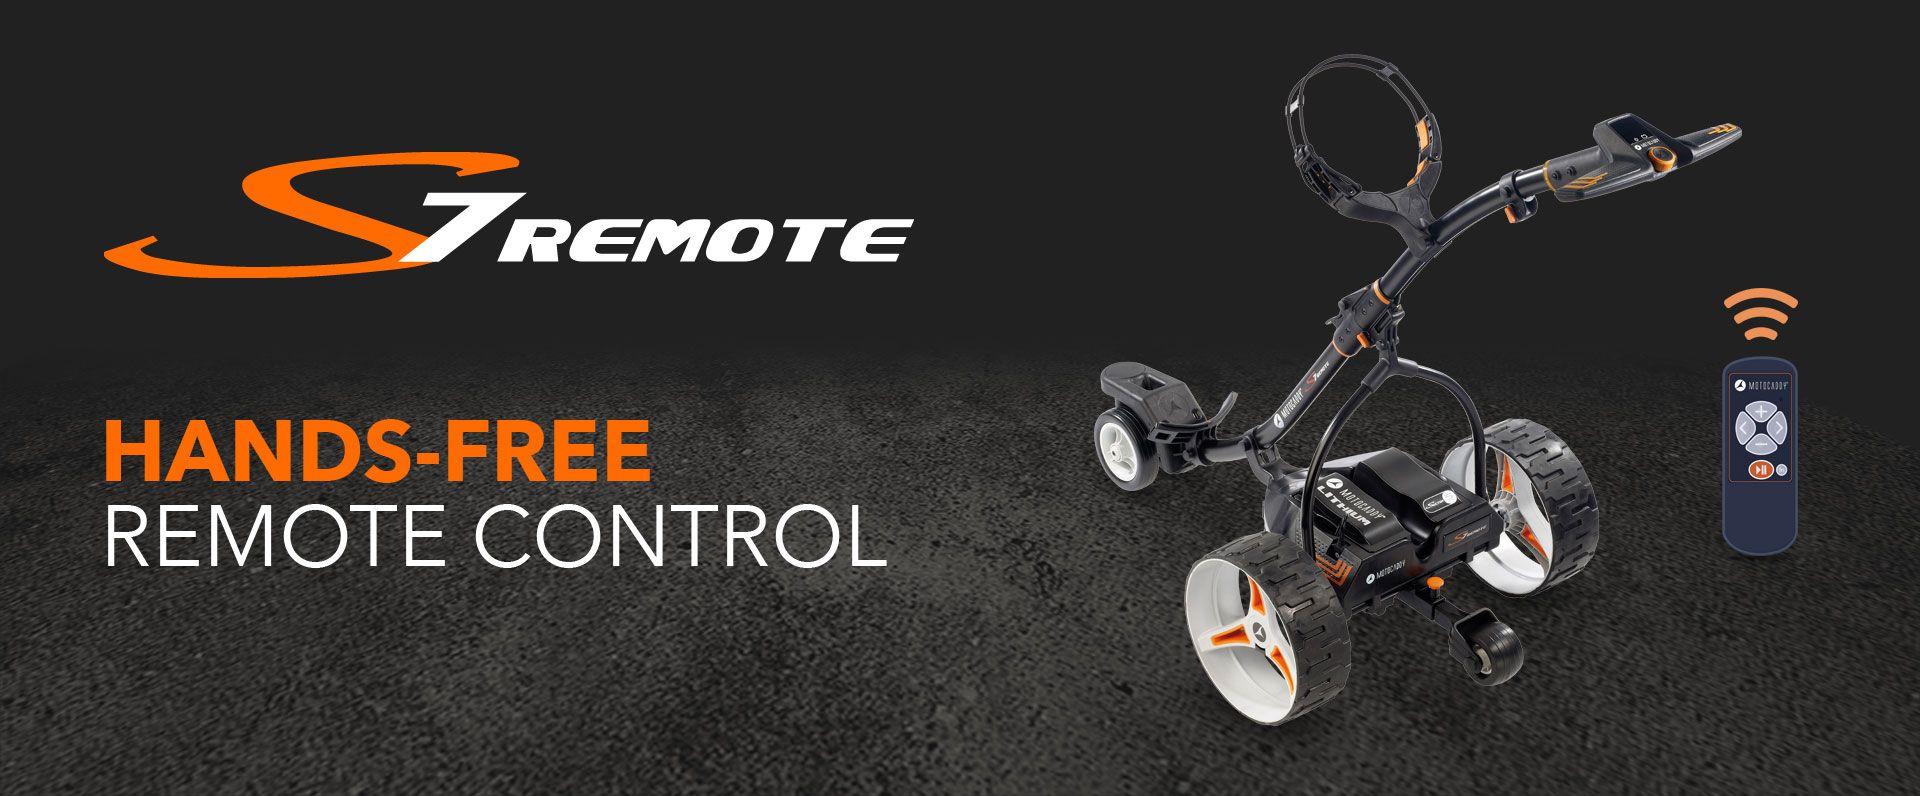 Motocaddy S7 Remote